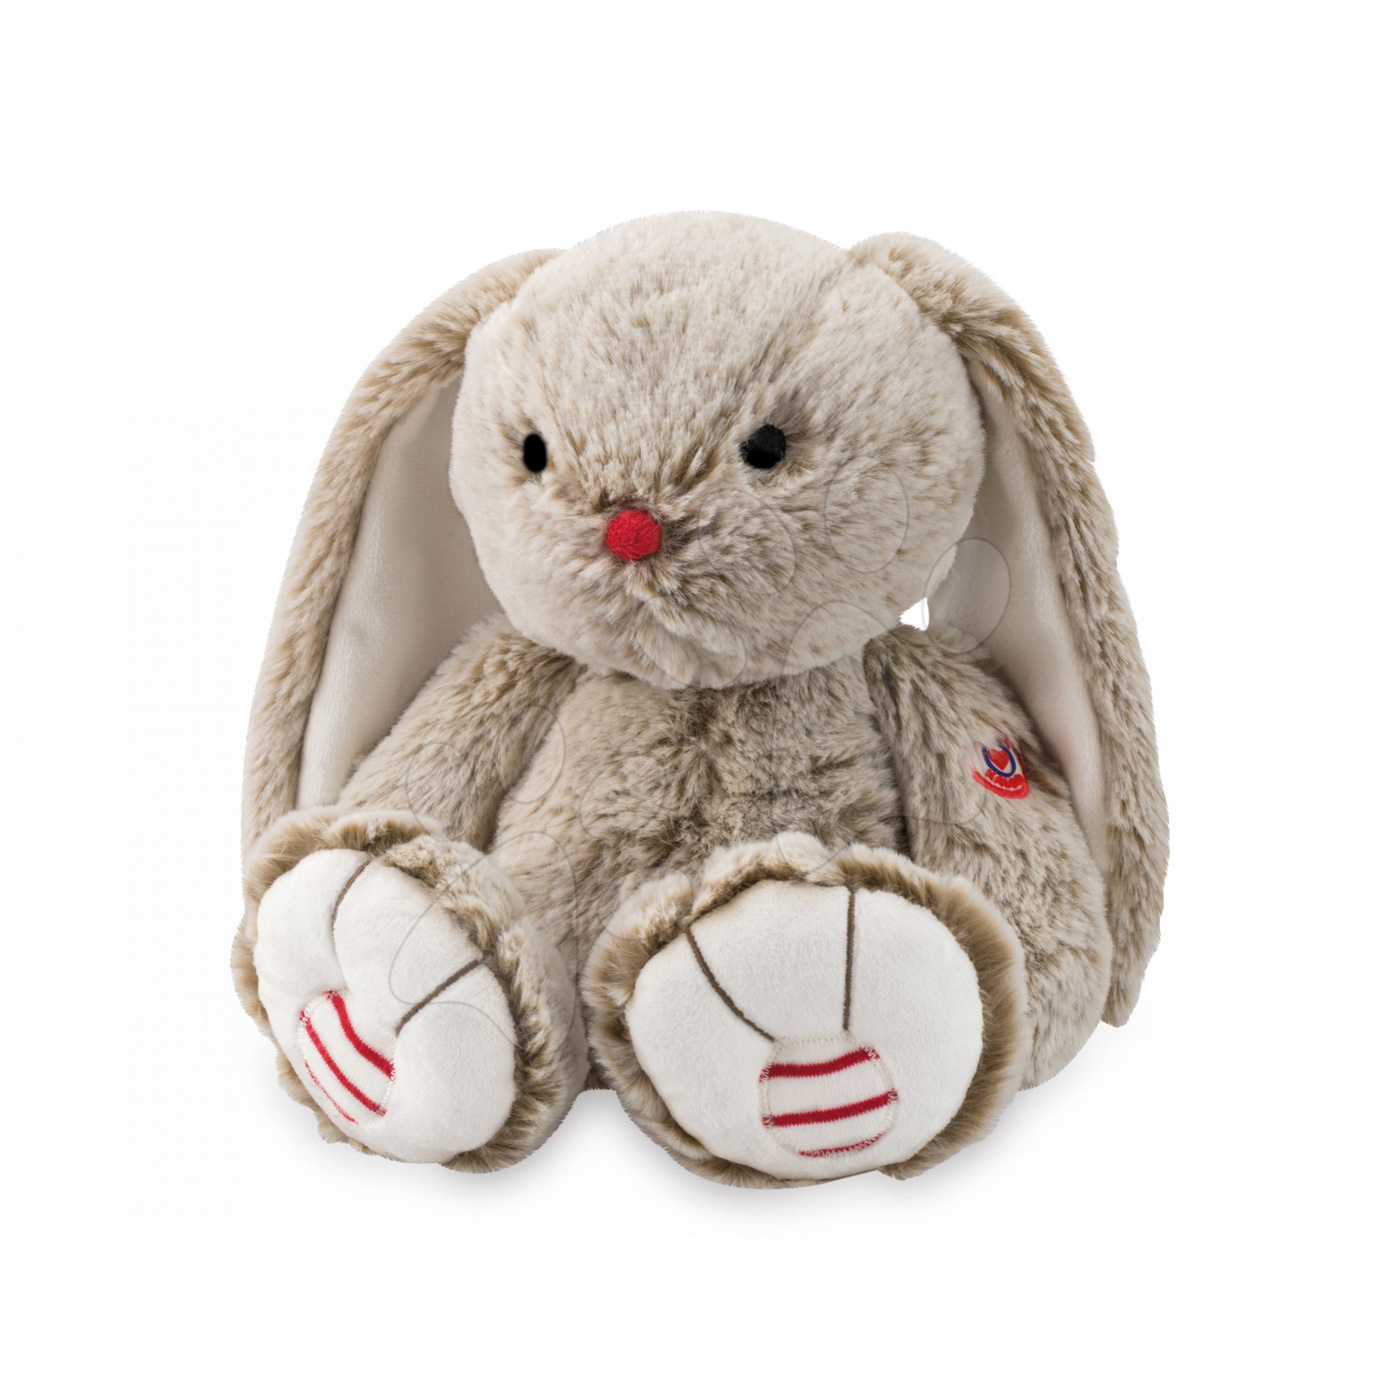 Plyšový zajačik Rouge Kaloo 31 cm pre najmenších béžový